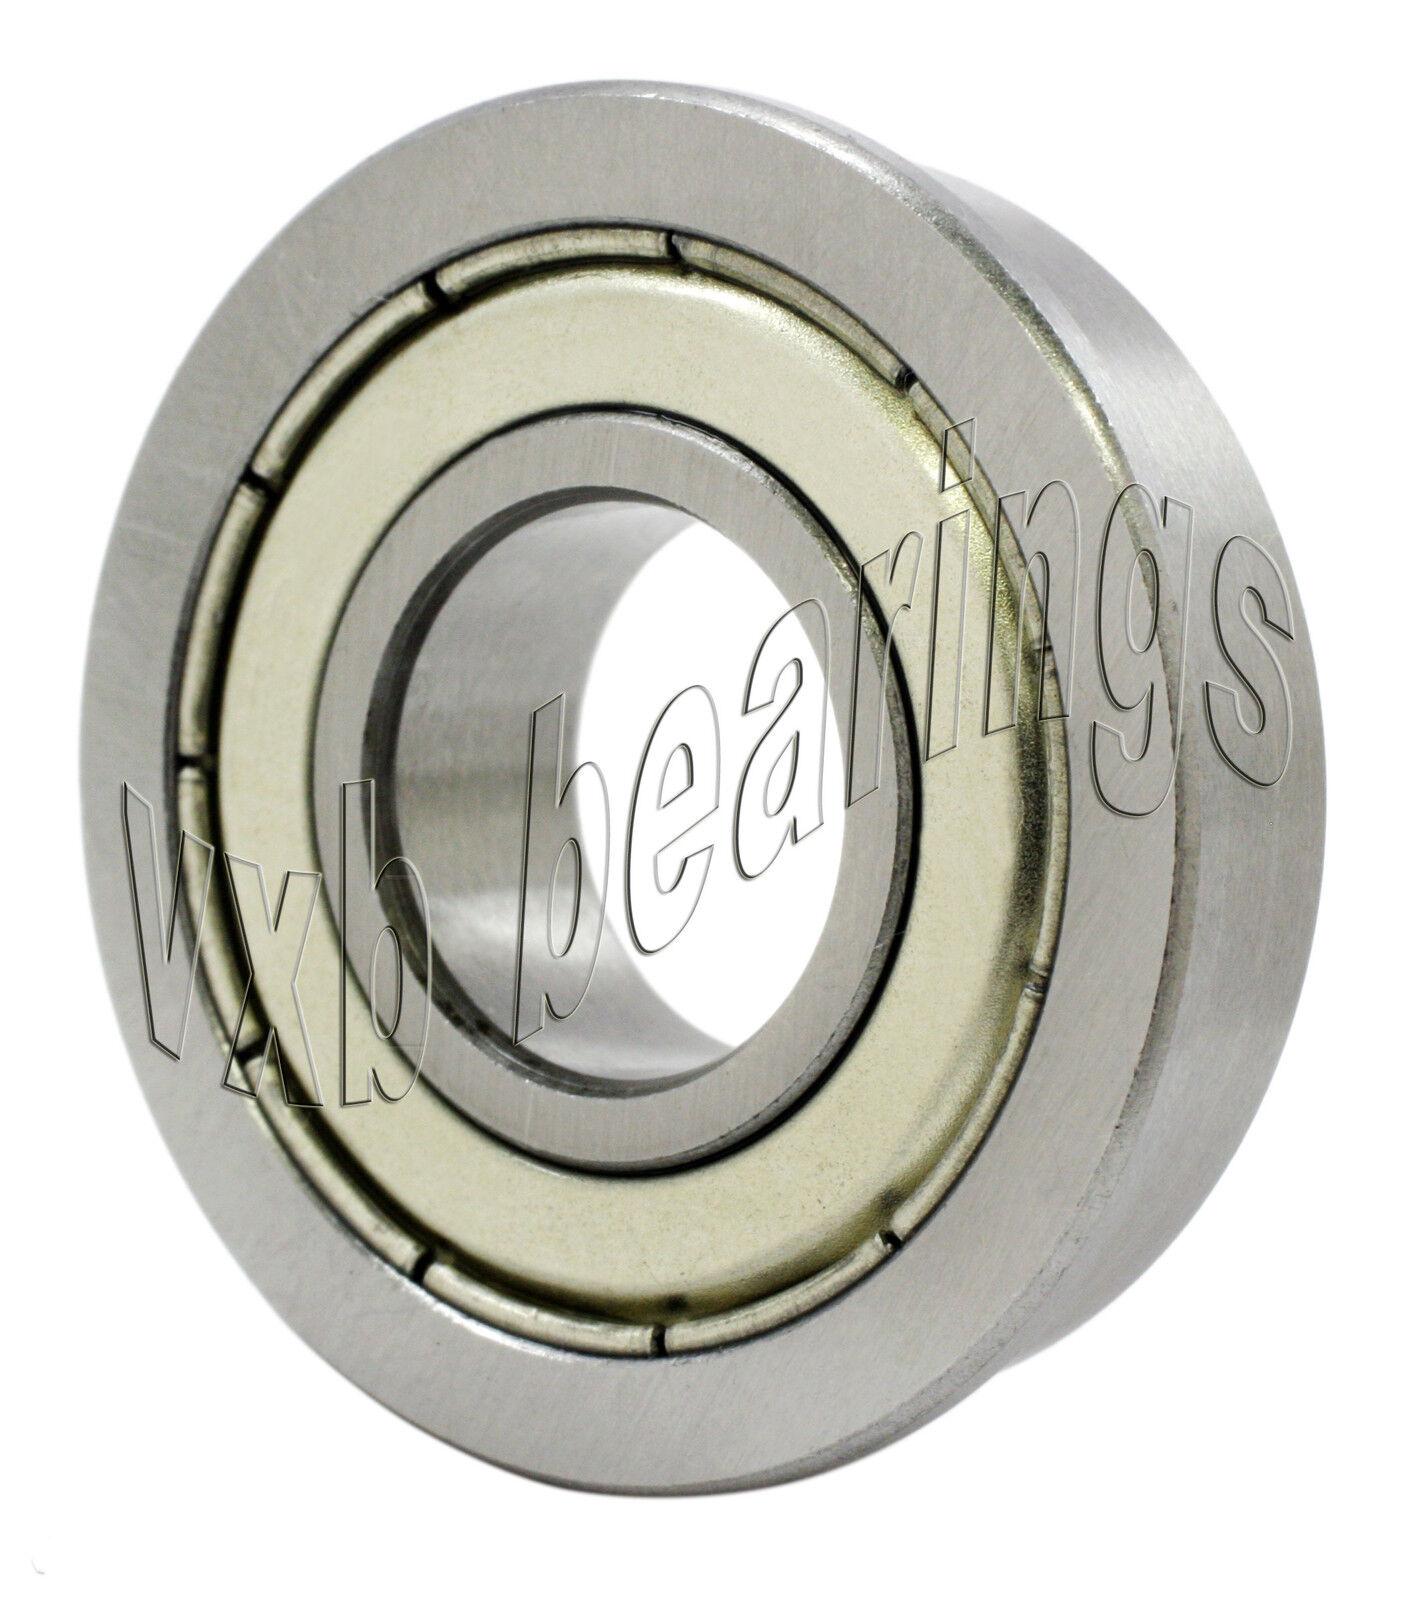 F698-RZ Flanged Bearing 8x19x6 Shielded Ball Bearings